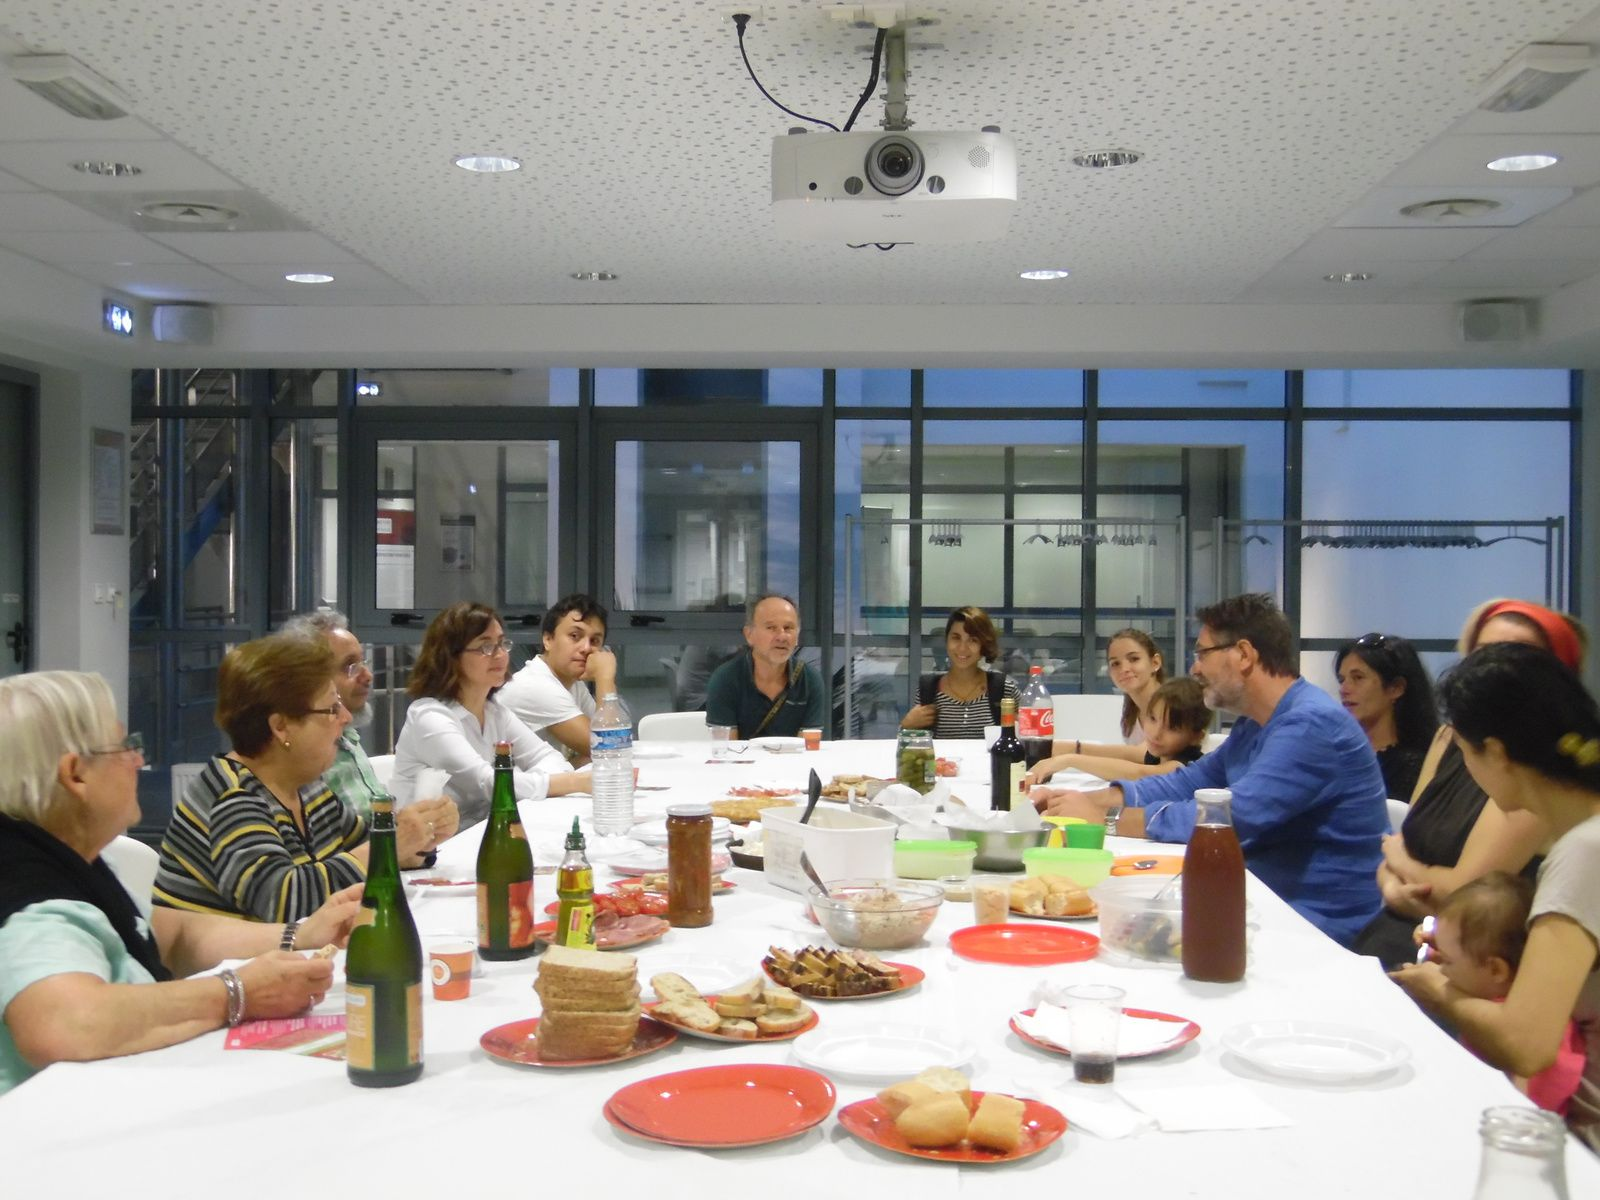 Les Rencontres Multiculturelles